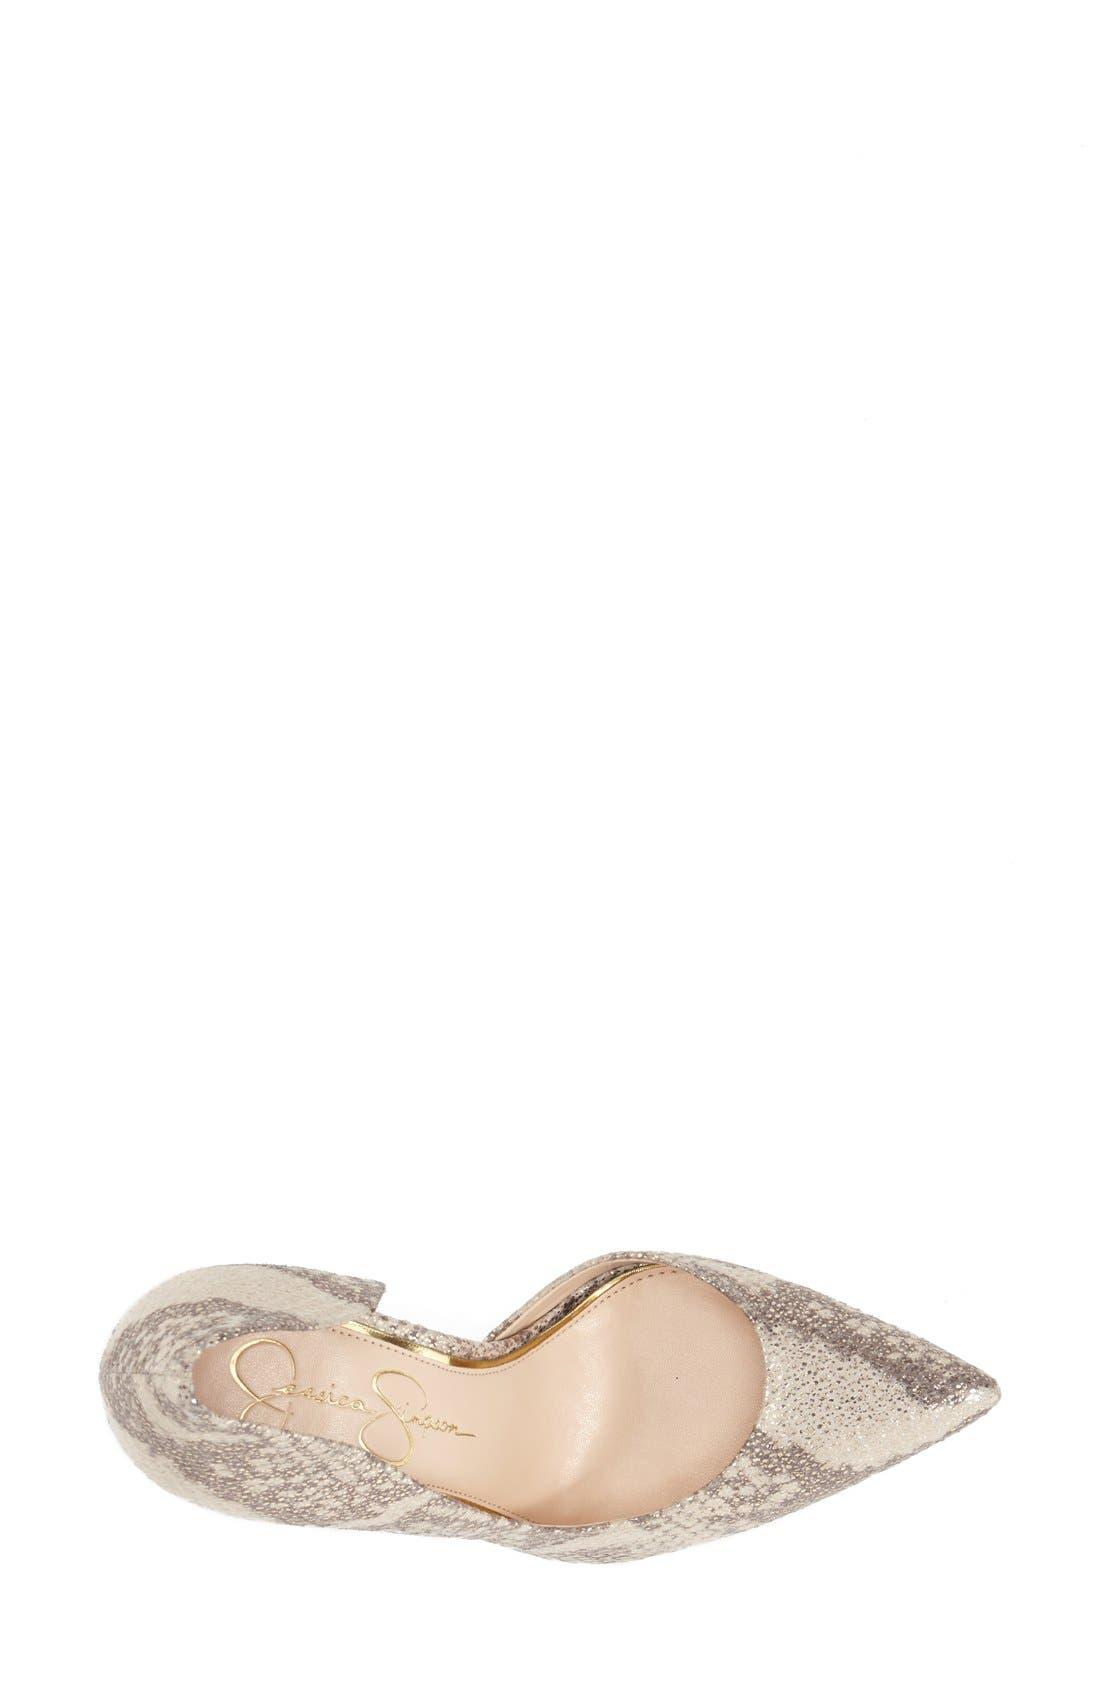 Alternate Image 3  - Jessica Simpson 'Claudette' Half d'Orsay Pump